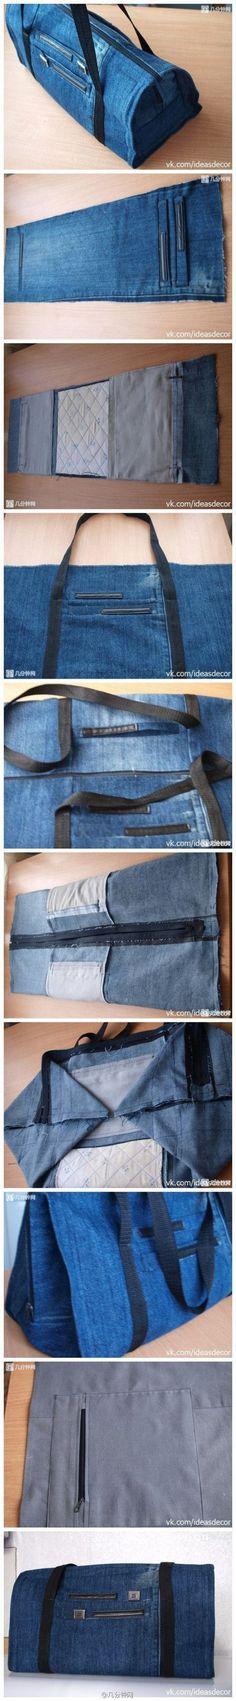 Bolsas de dril de algodón